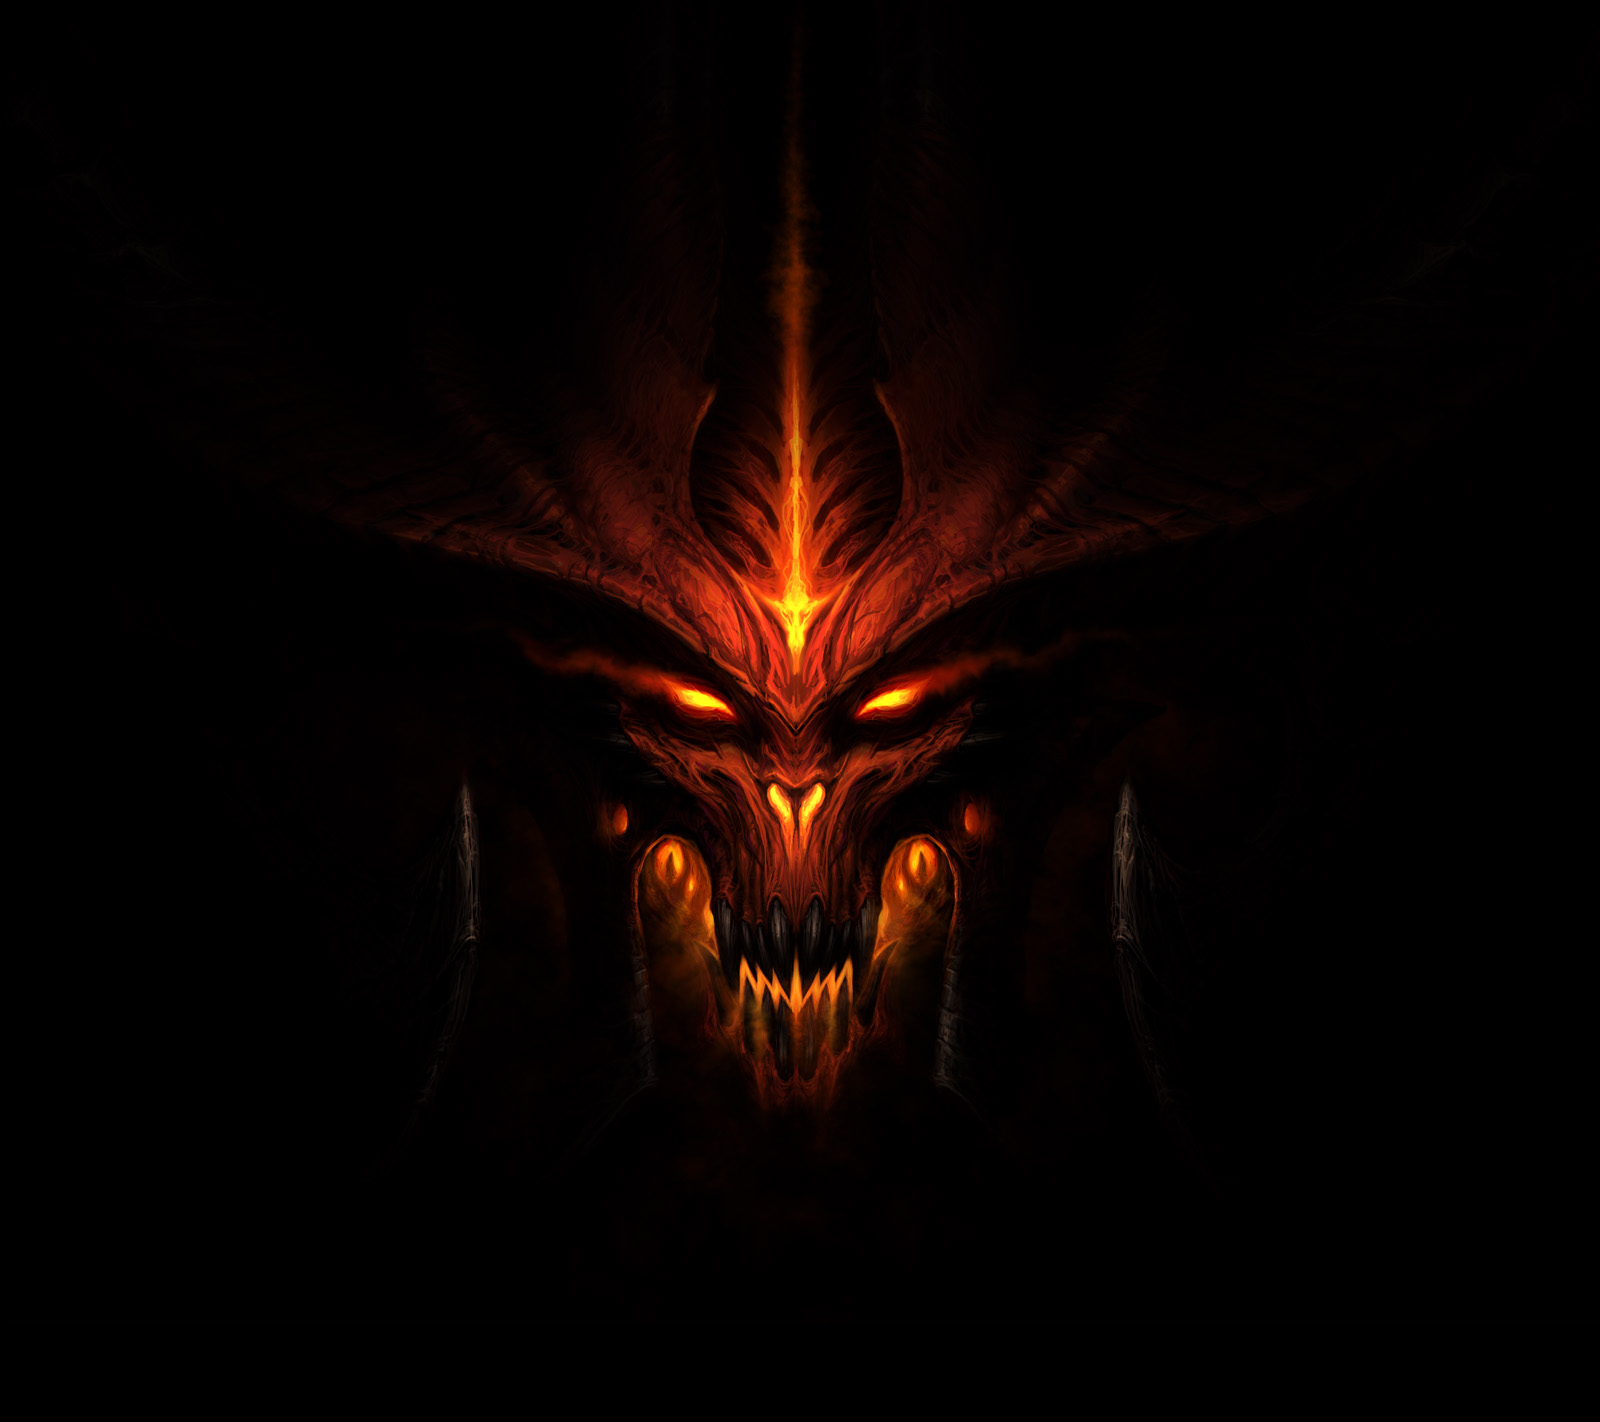 sataness